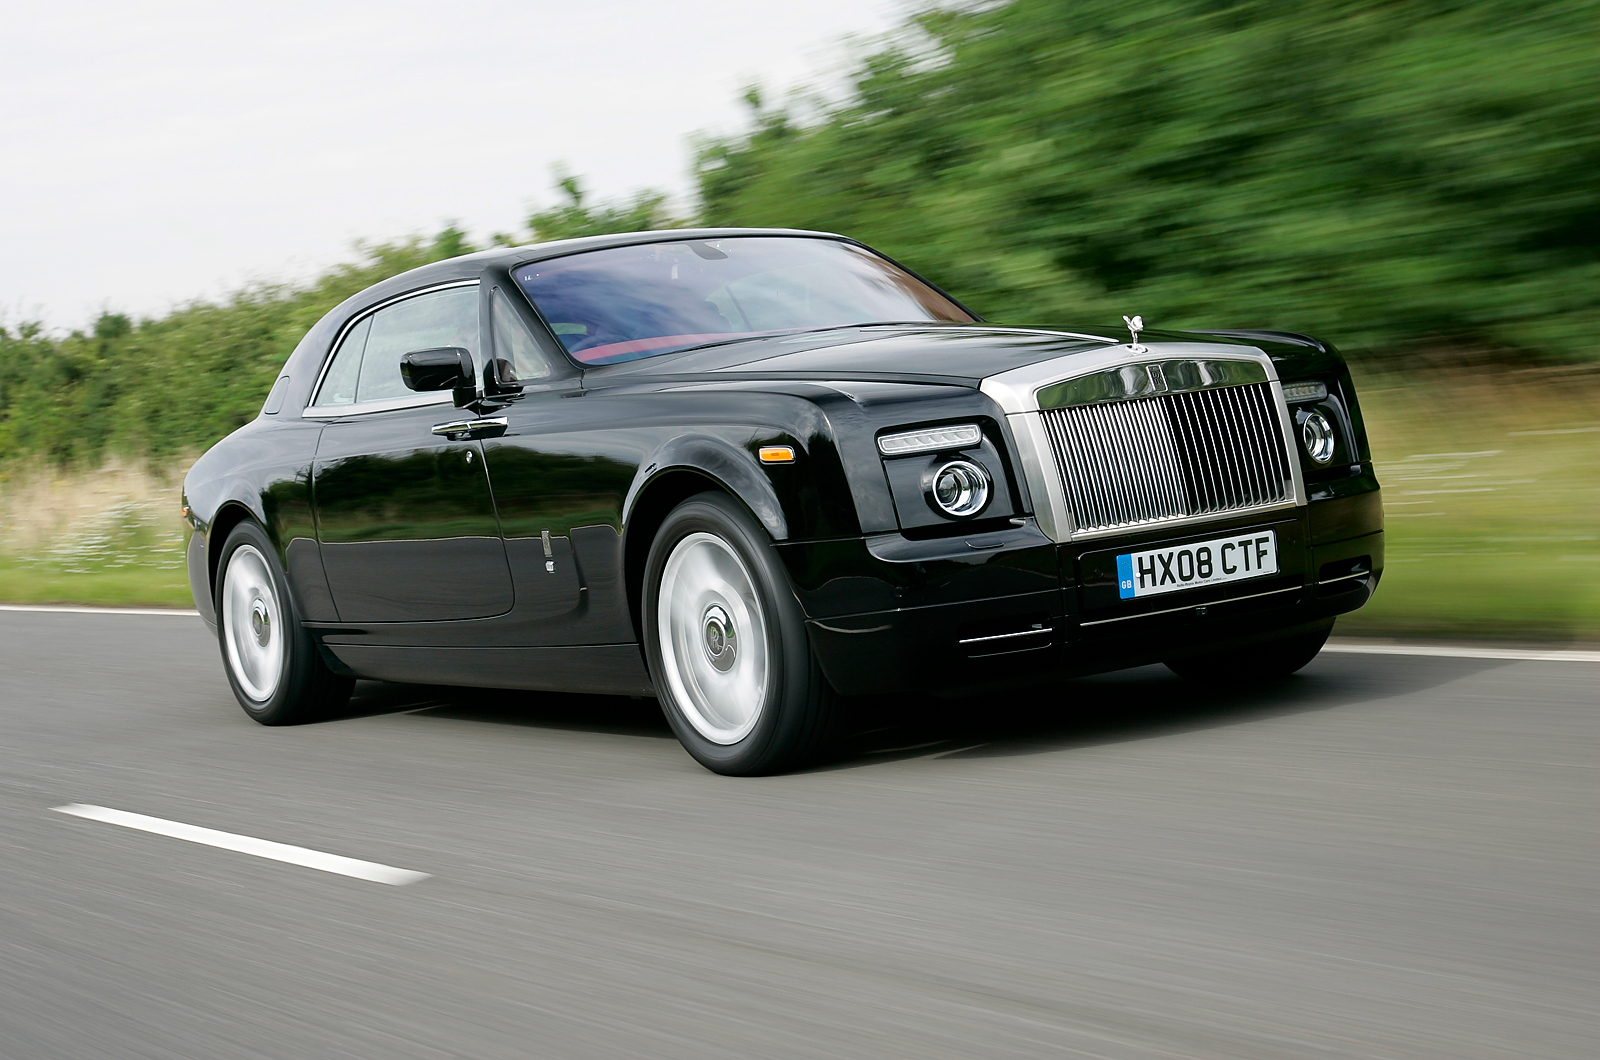 HD Cars Wallpapers: Rolls Royce Phantom